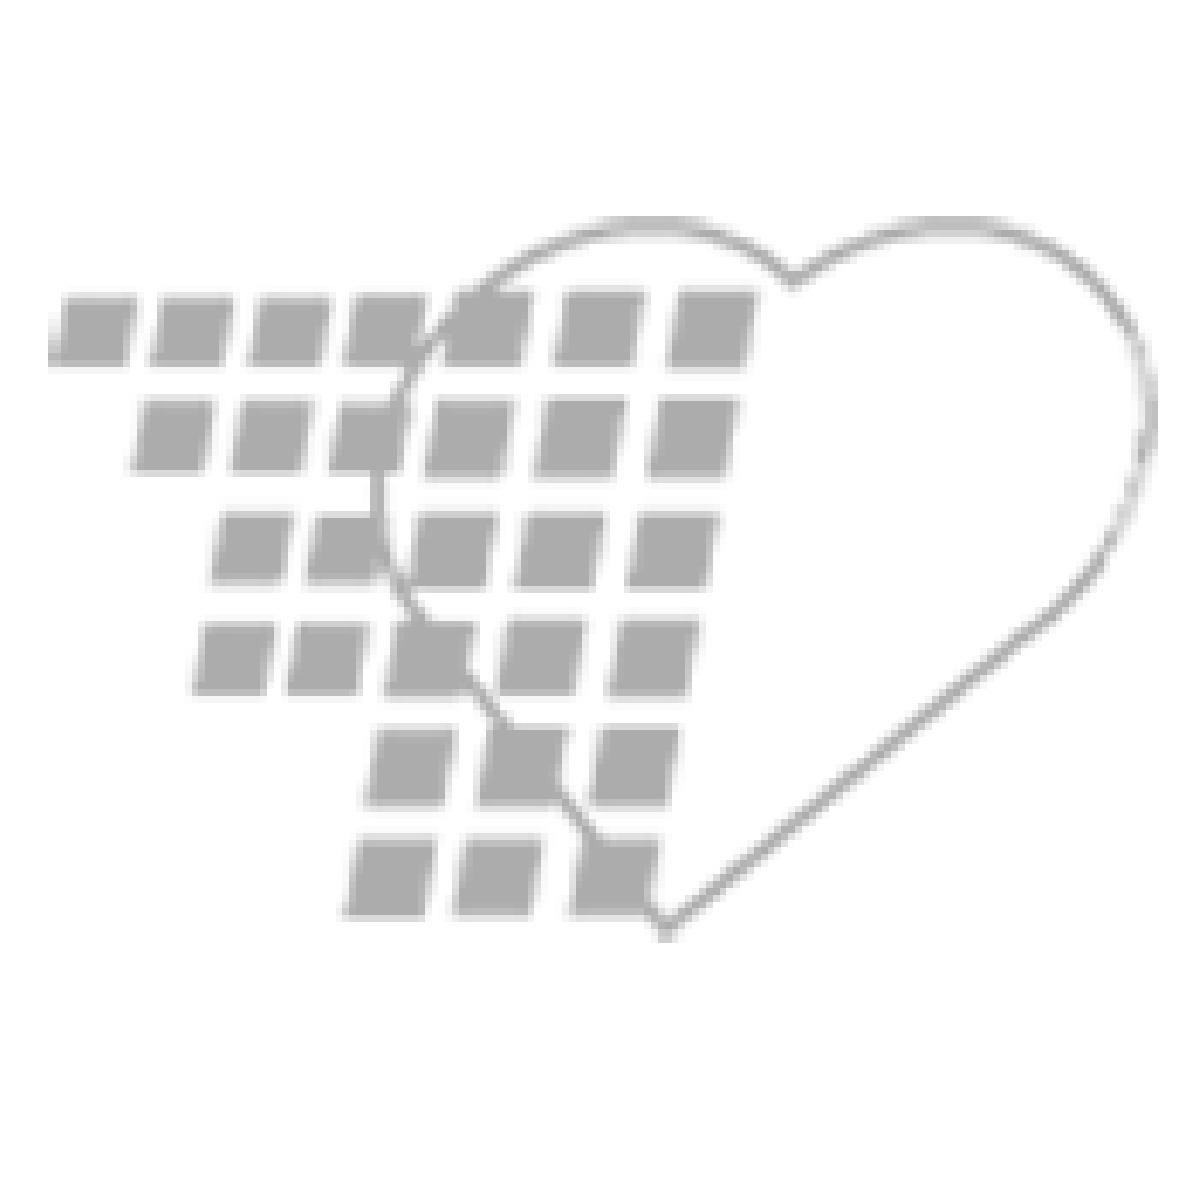 02-43-9851 Symbio 12 lead ECG Simulator Module